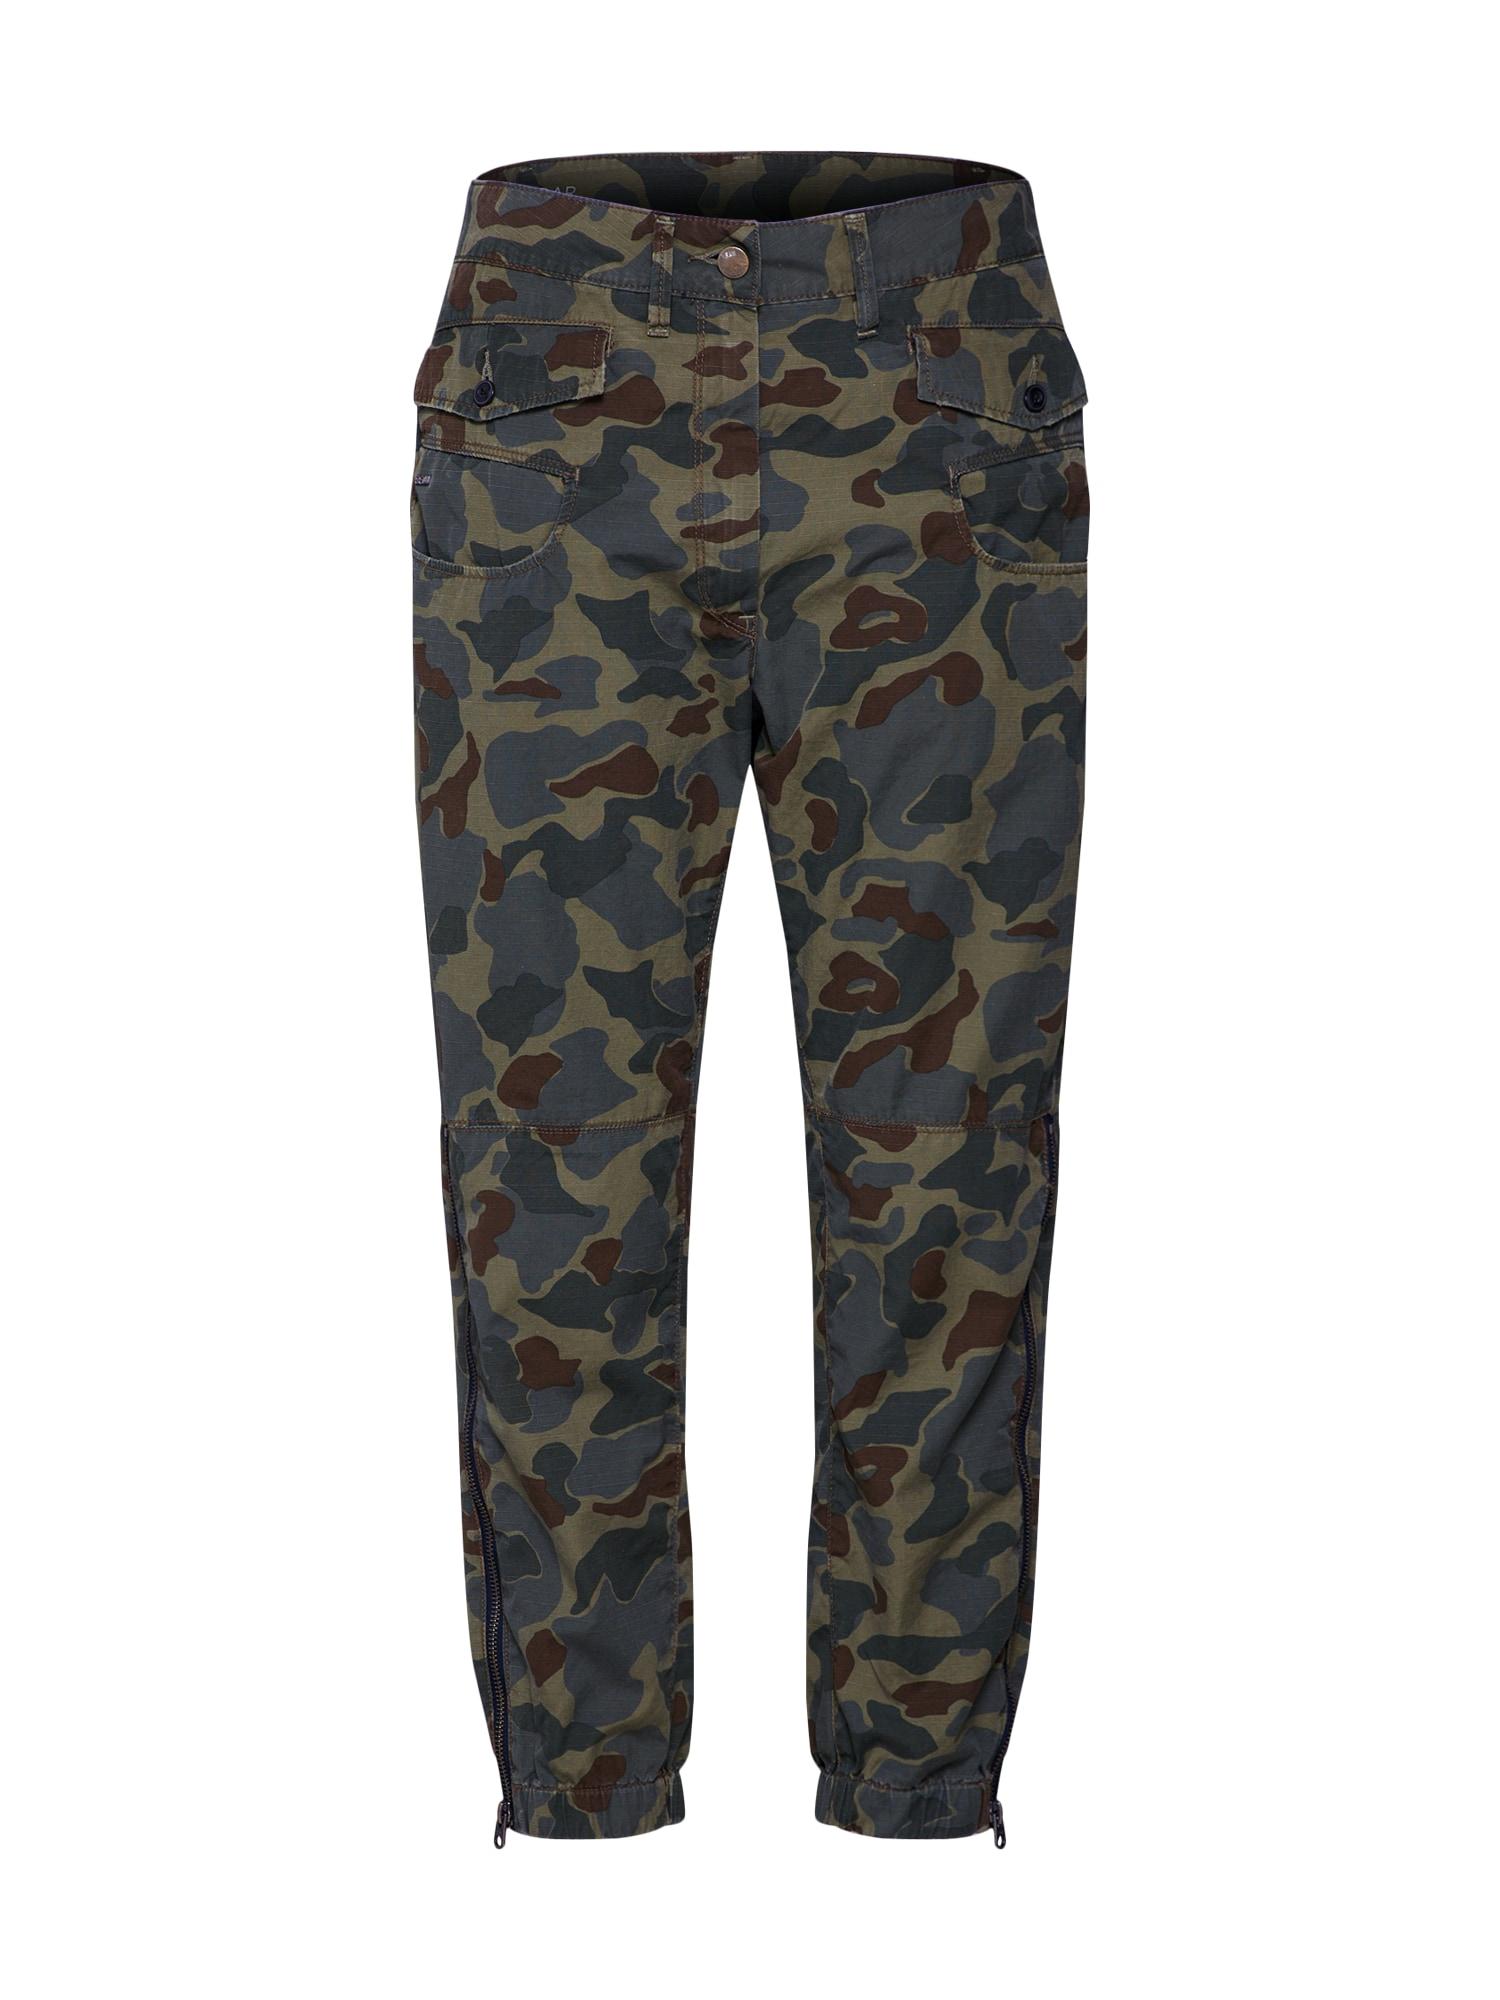 Kalhoty Army radar khaki mix barev G-STAR RAW